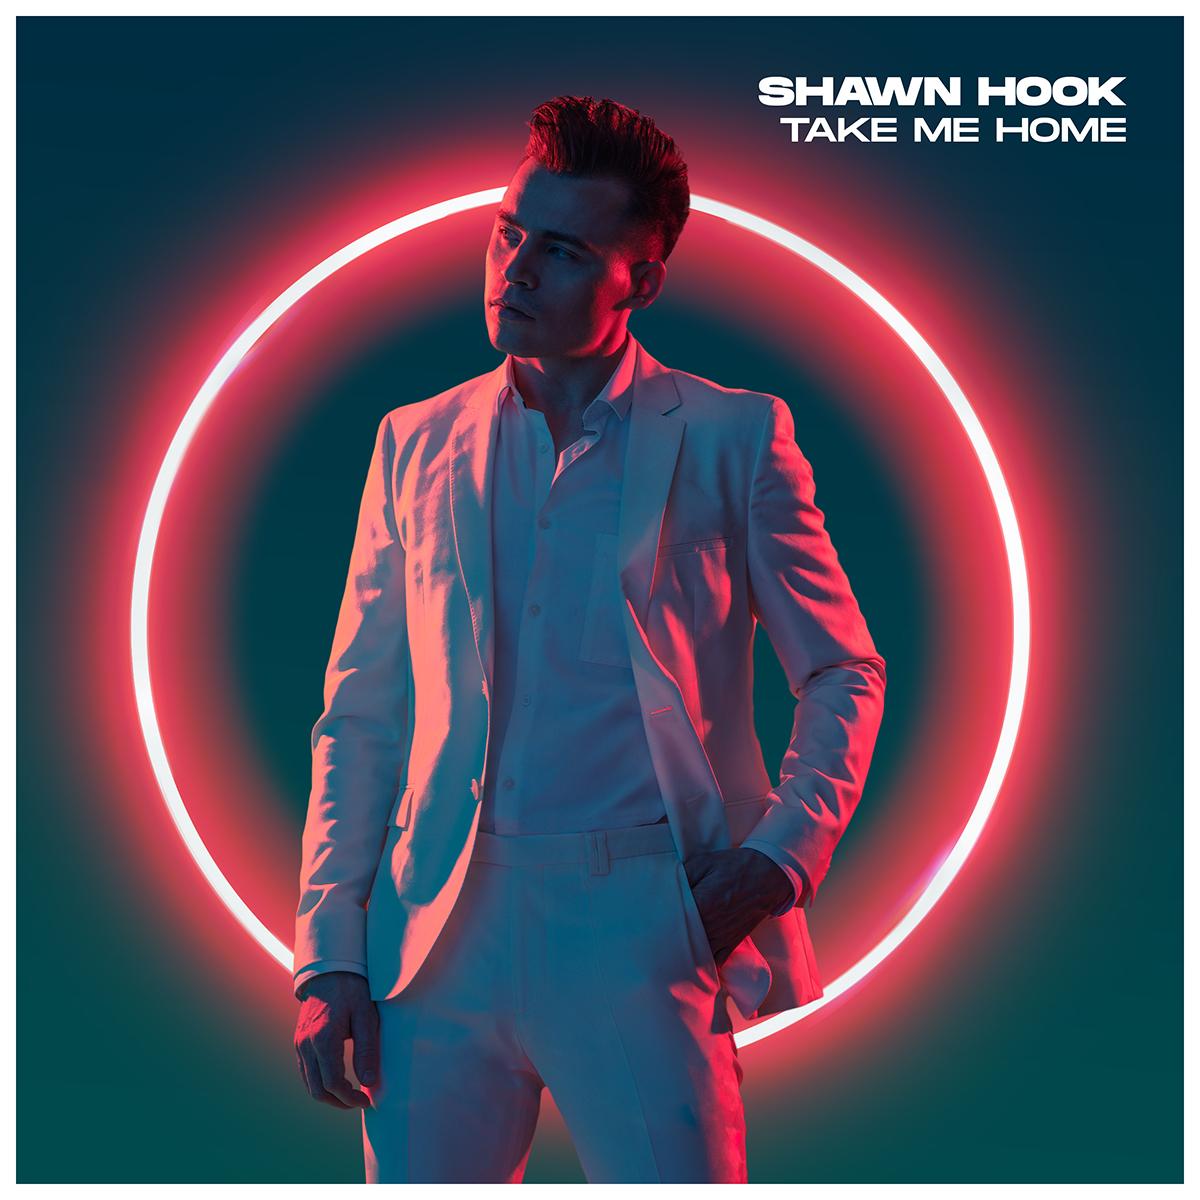 Shawn Hook - Take Me Home 1200px